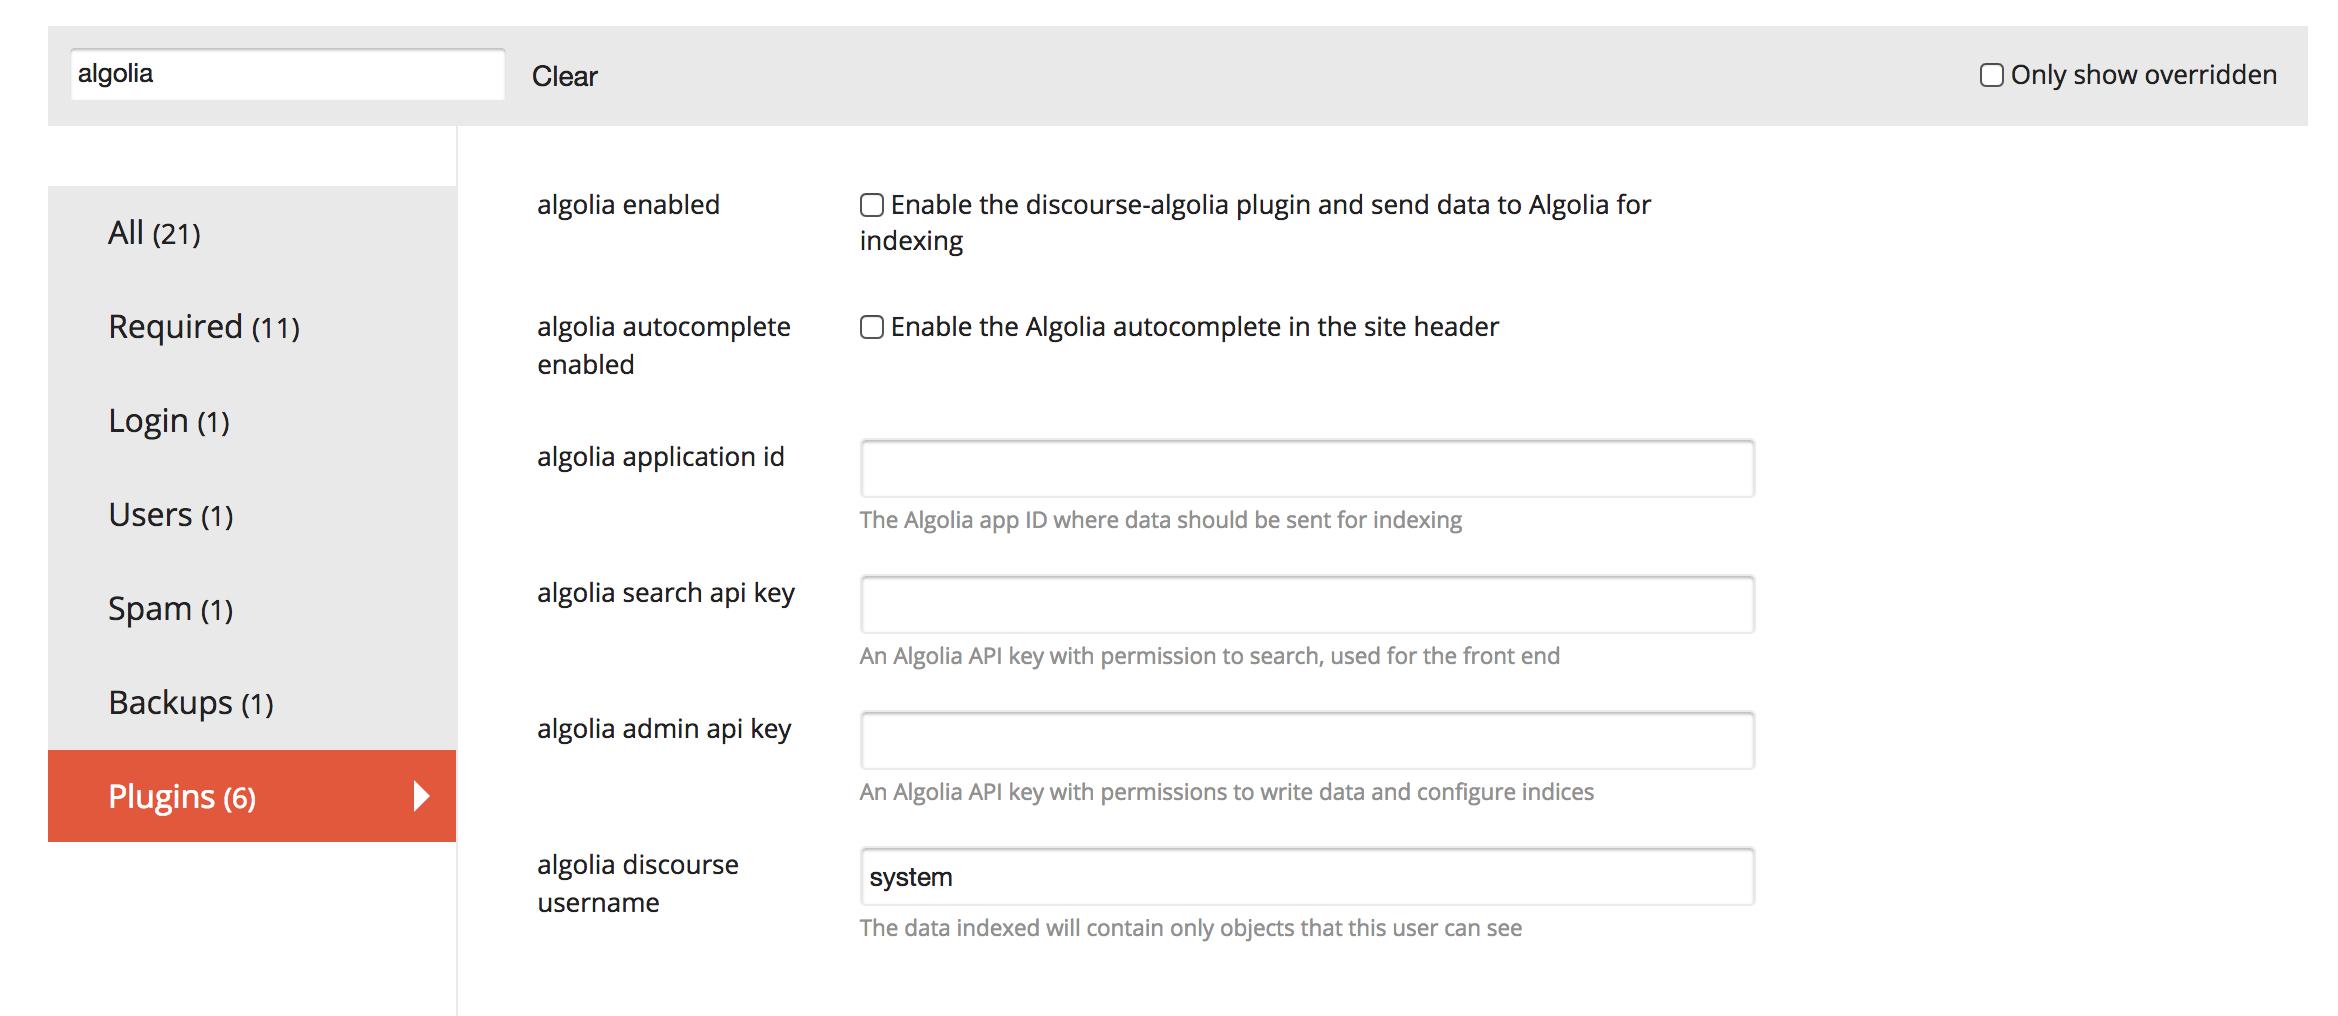 discourse-algolia configuration options